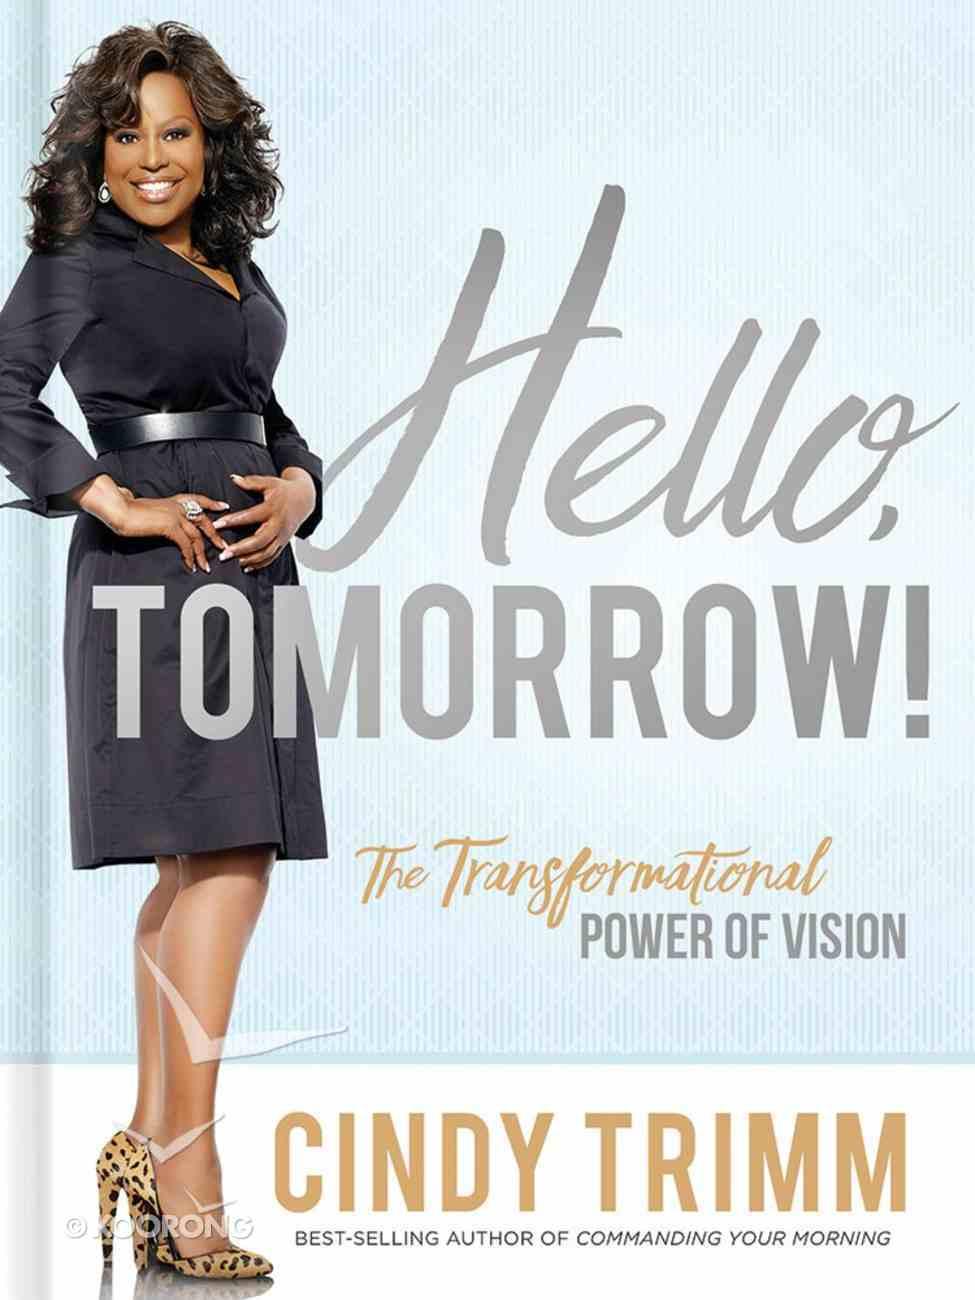 Hello, Tomorrow!: The Transformational Power of Vision Hardback